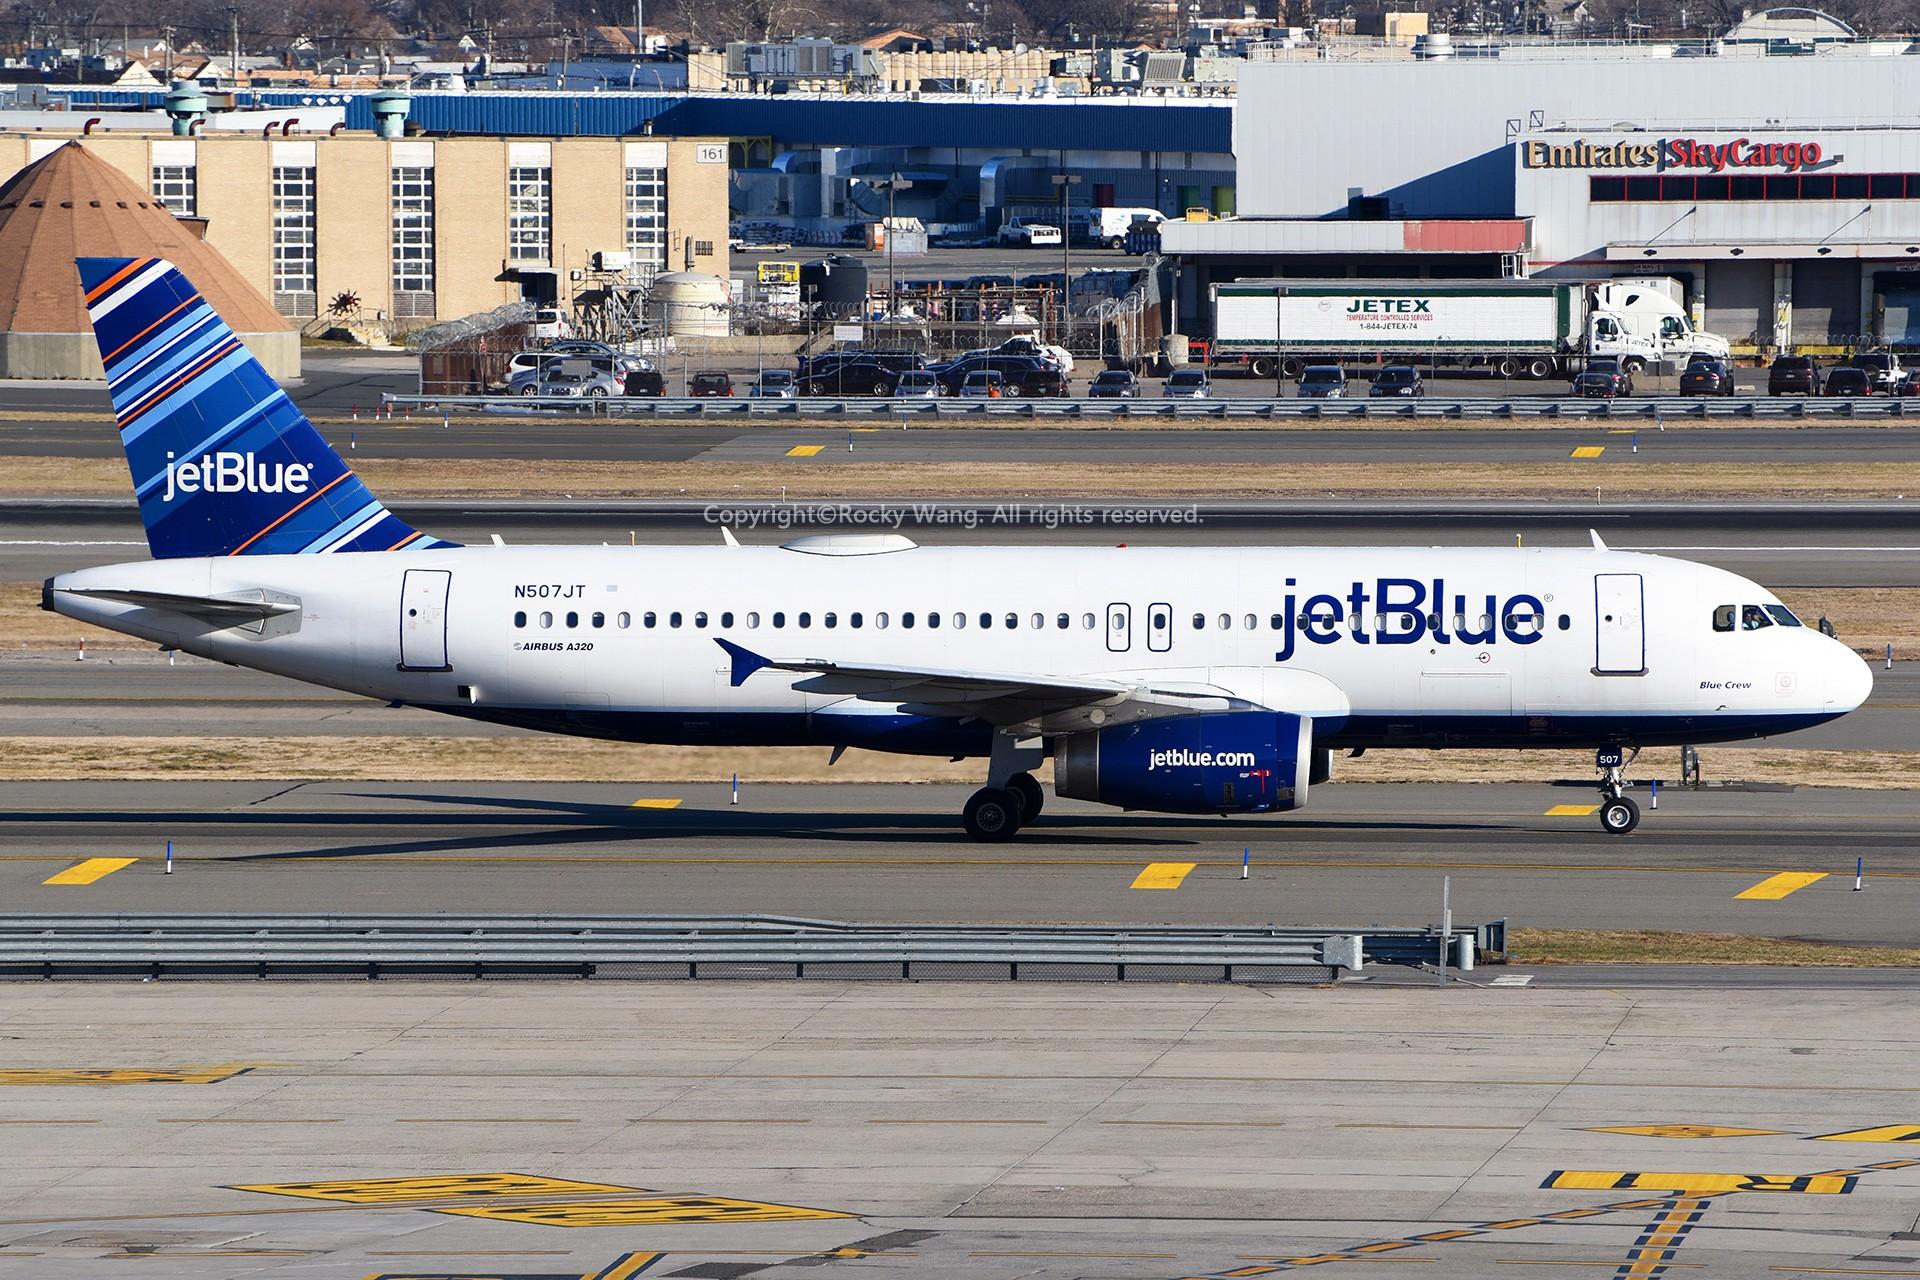 Re:[原创]窄体连连看 AIRBUS A320-232 N507JT 美国纽约约翰·菲茨杰拉德·肯尼迪国际机场